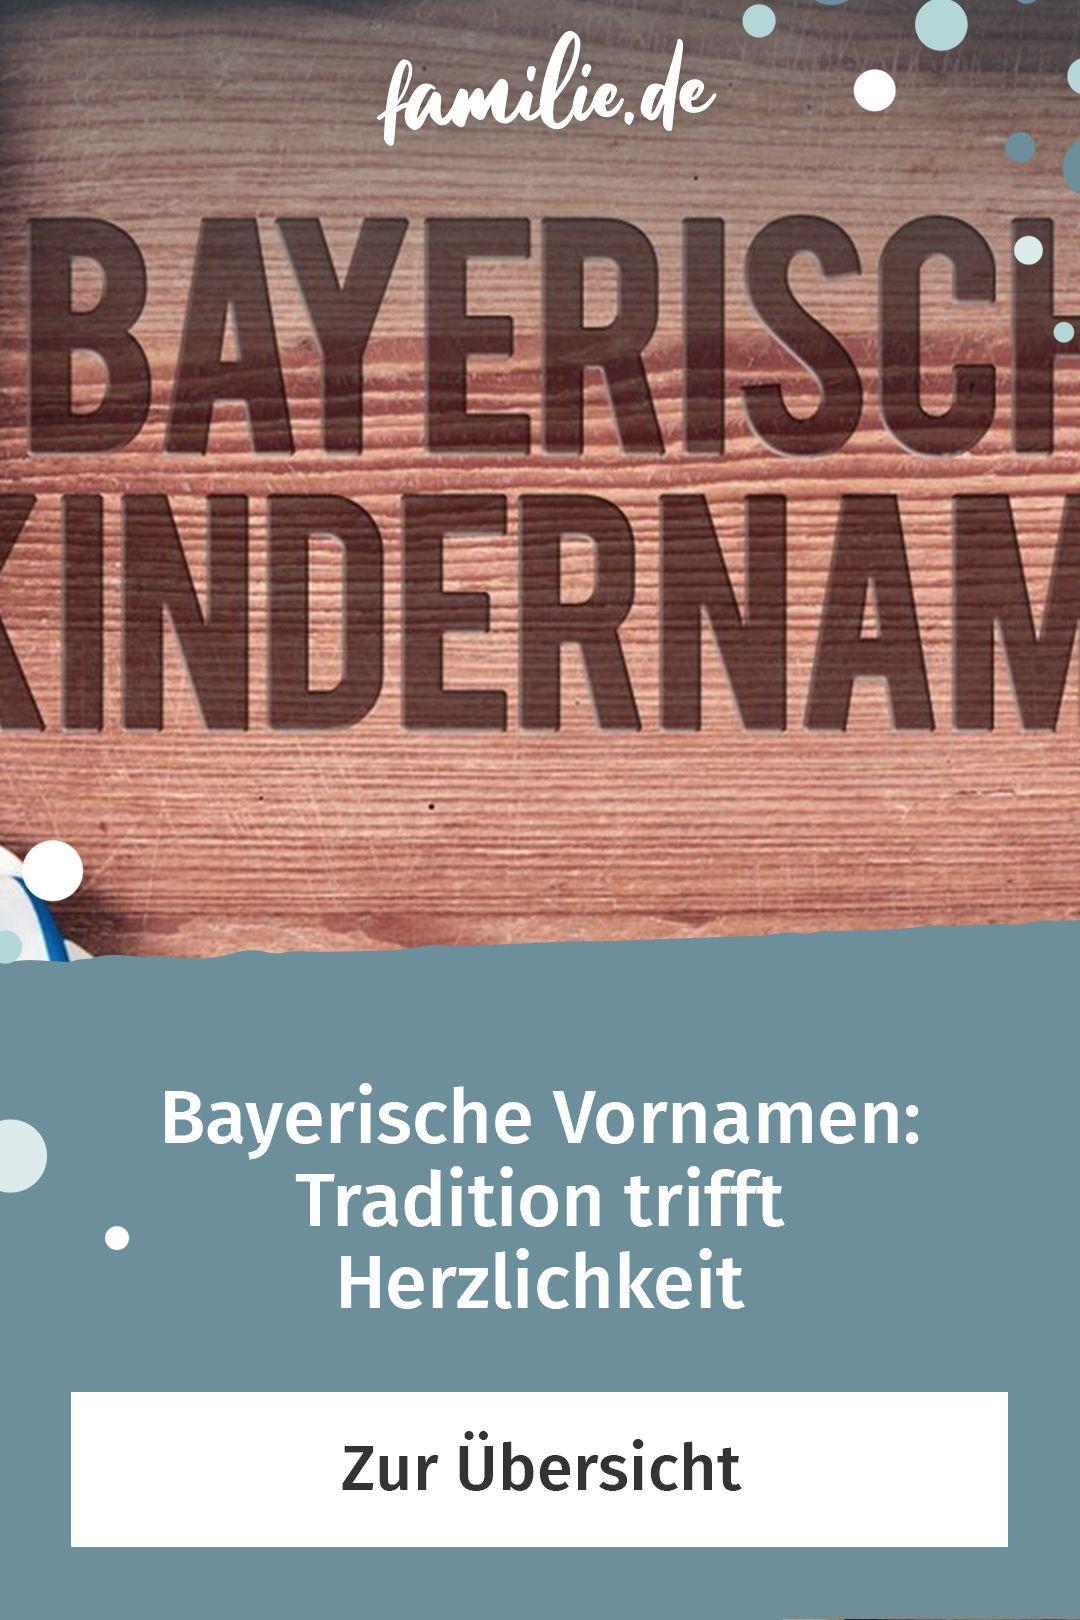 Bayerische Babynamen